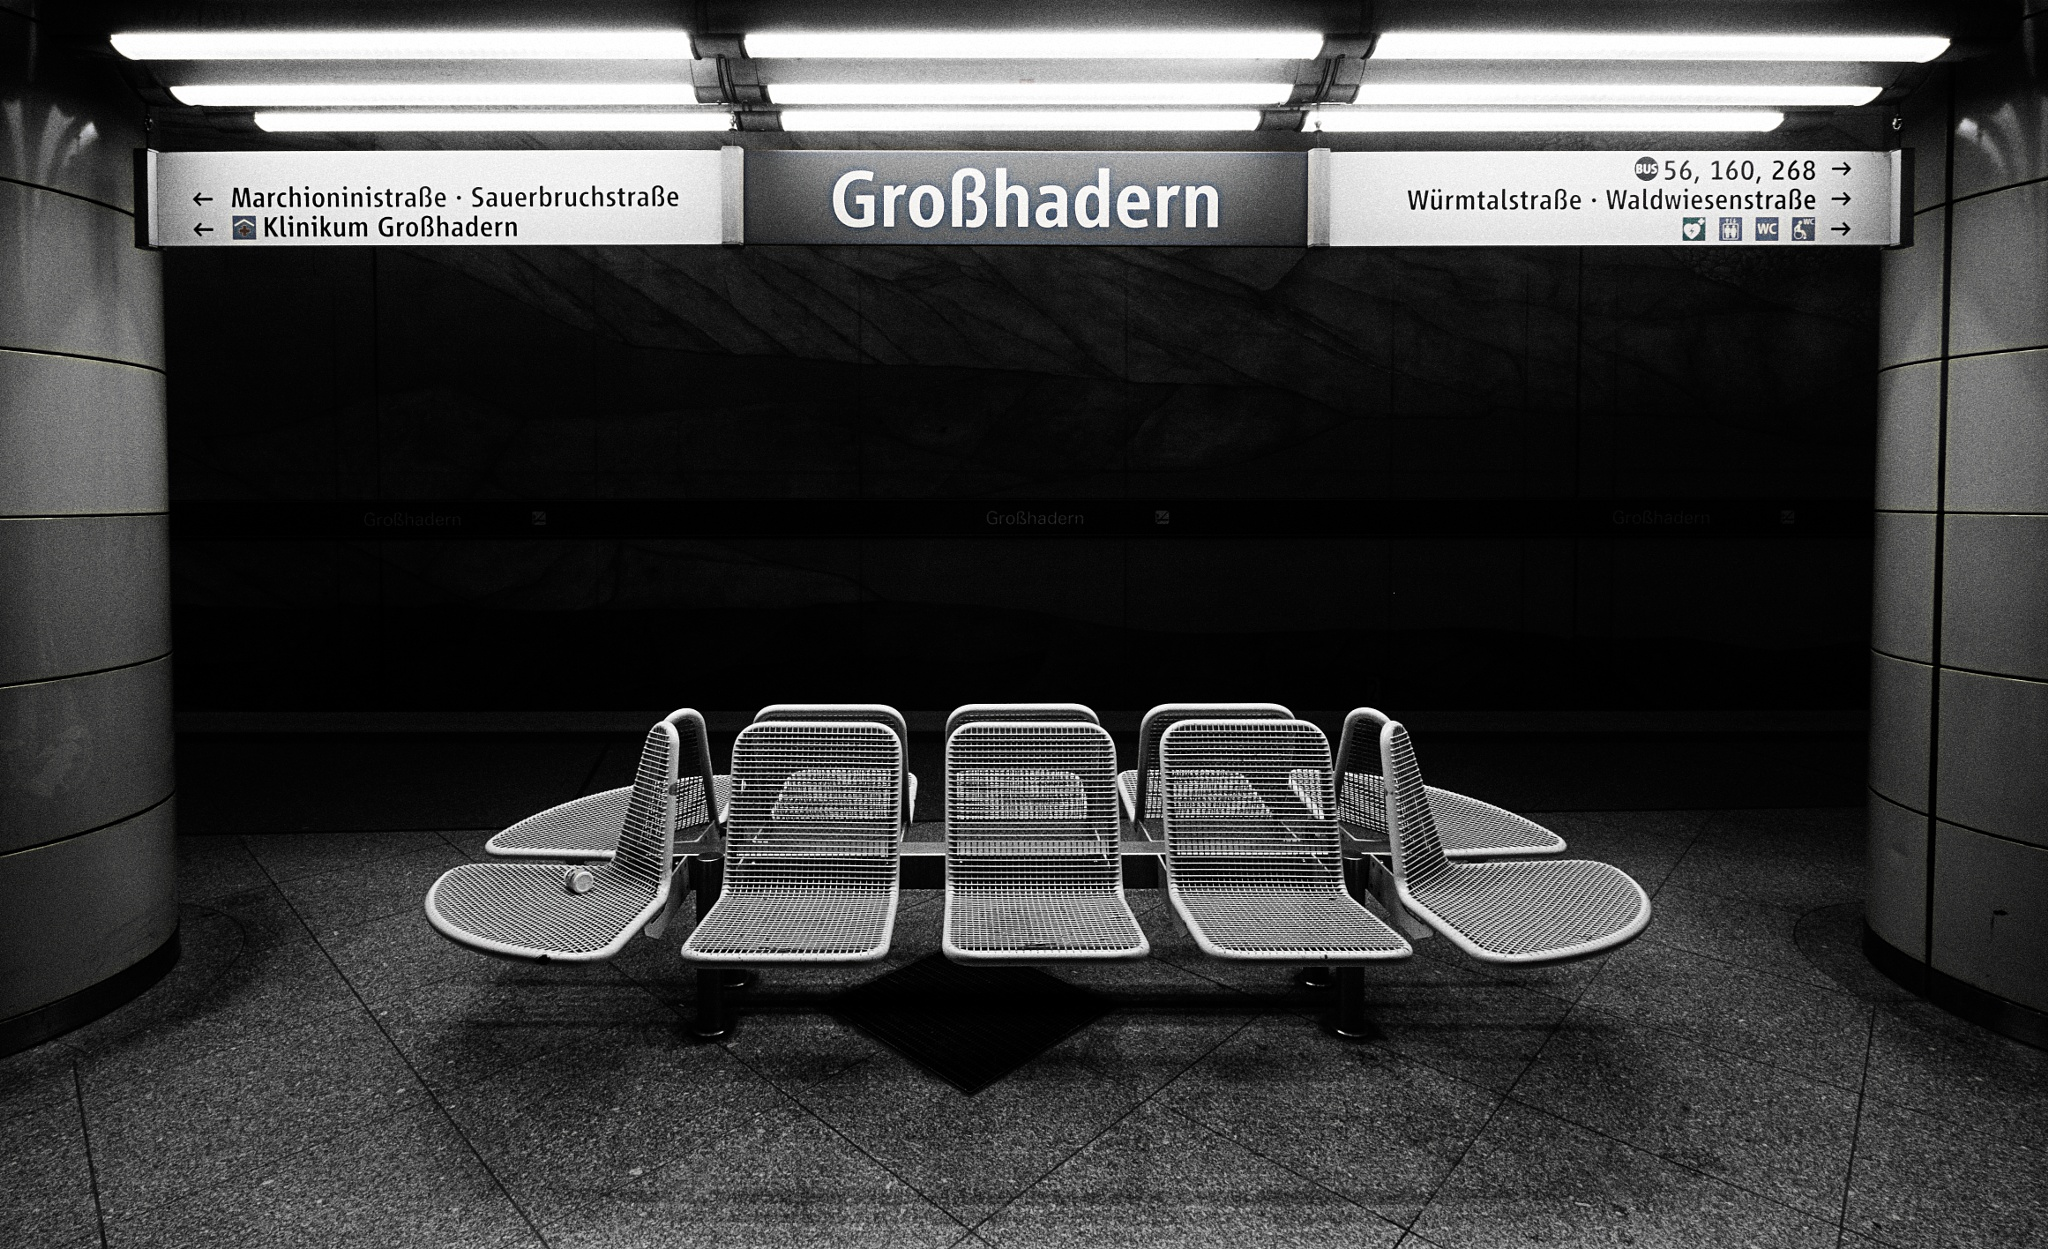 Untitled by Ulrich Gerndt